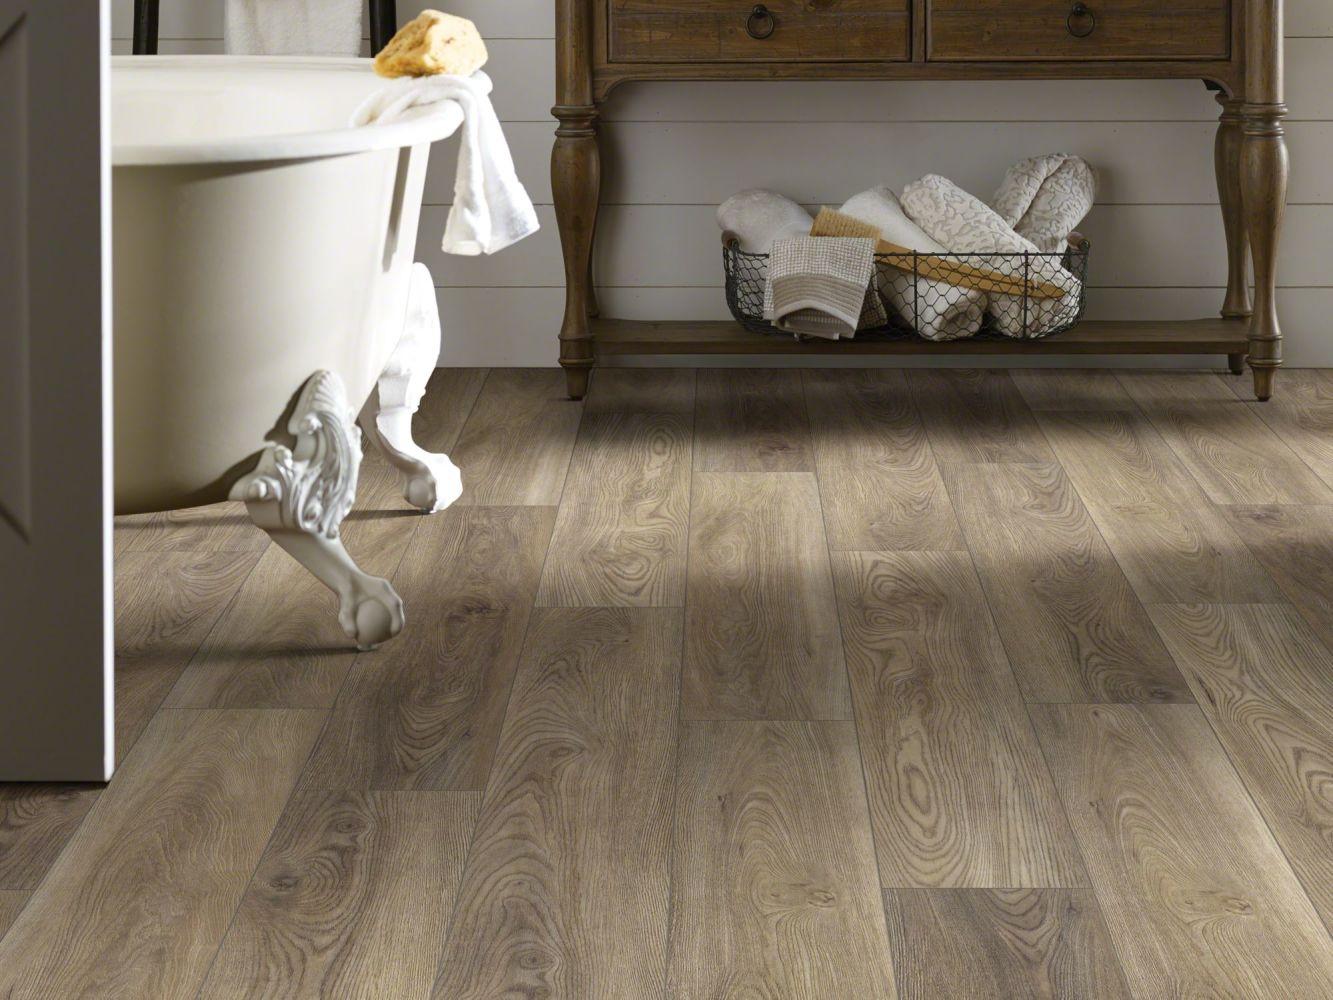 Shaw Floors Resilient Residential Distinction Plus Ash Oak 07065_2045V